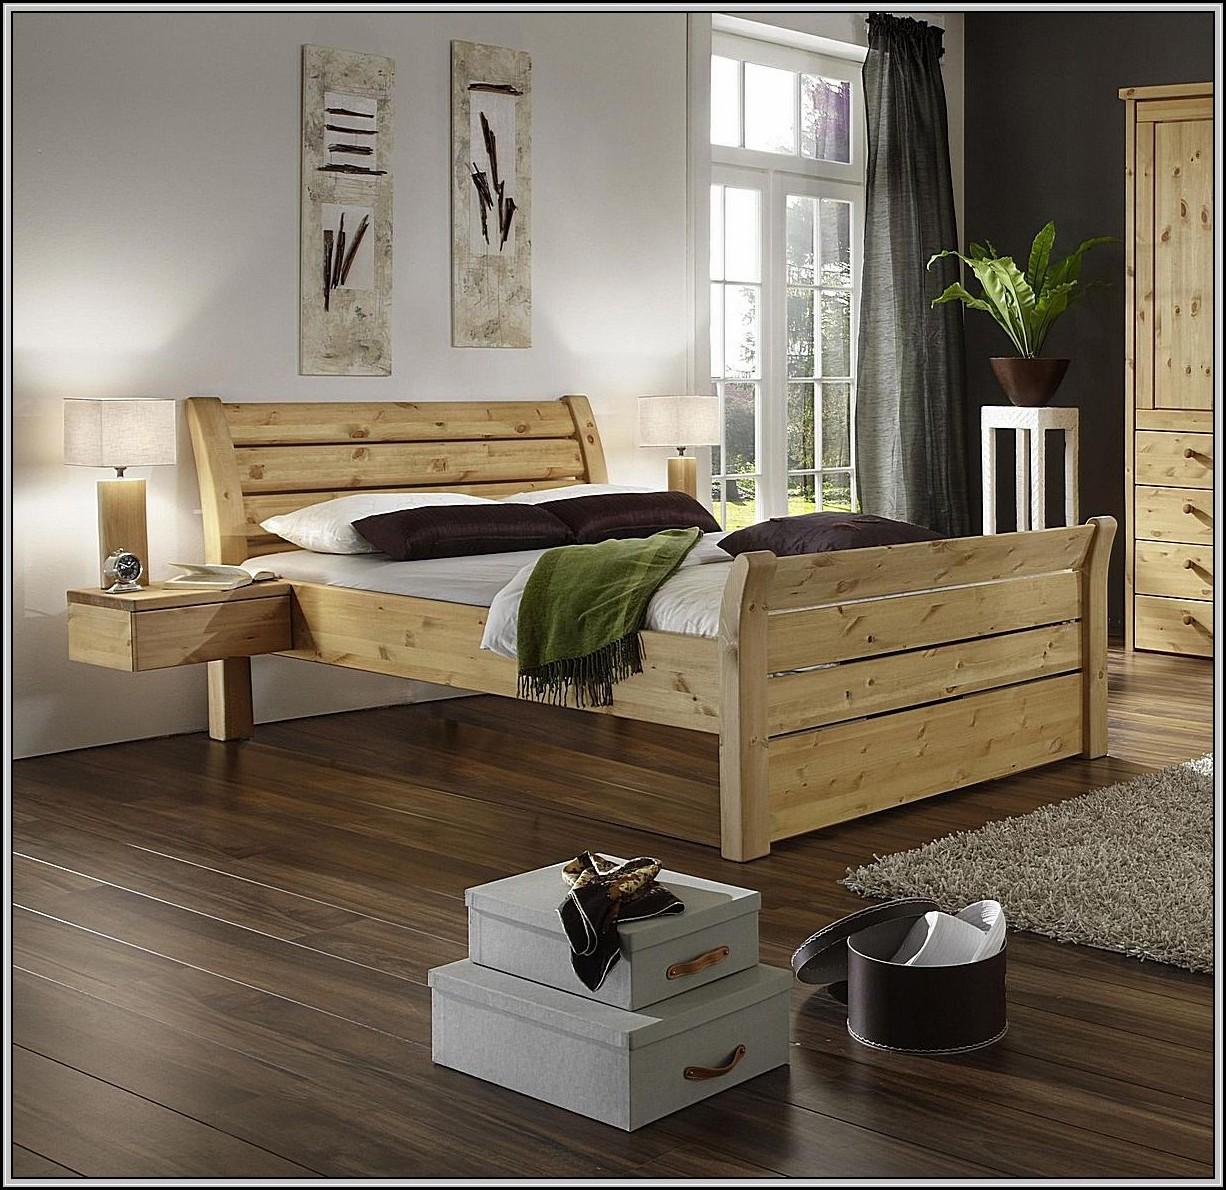 Kiefer Bett 140x200 Gebraucht